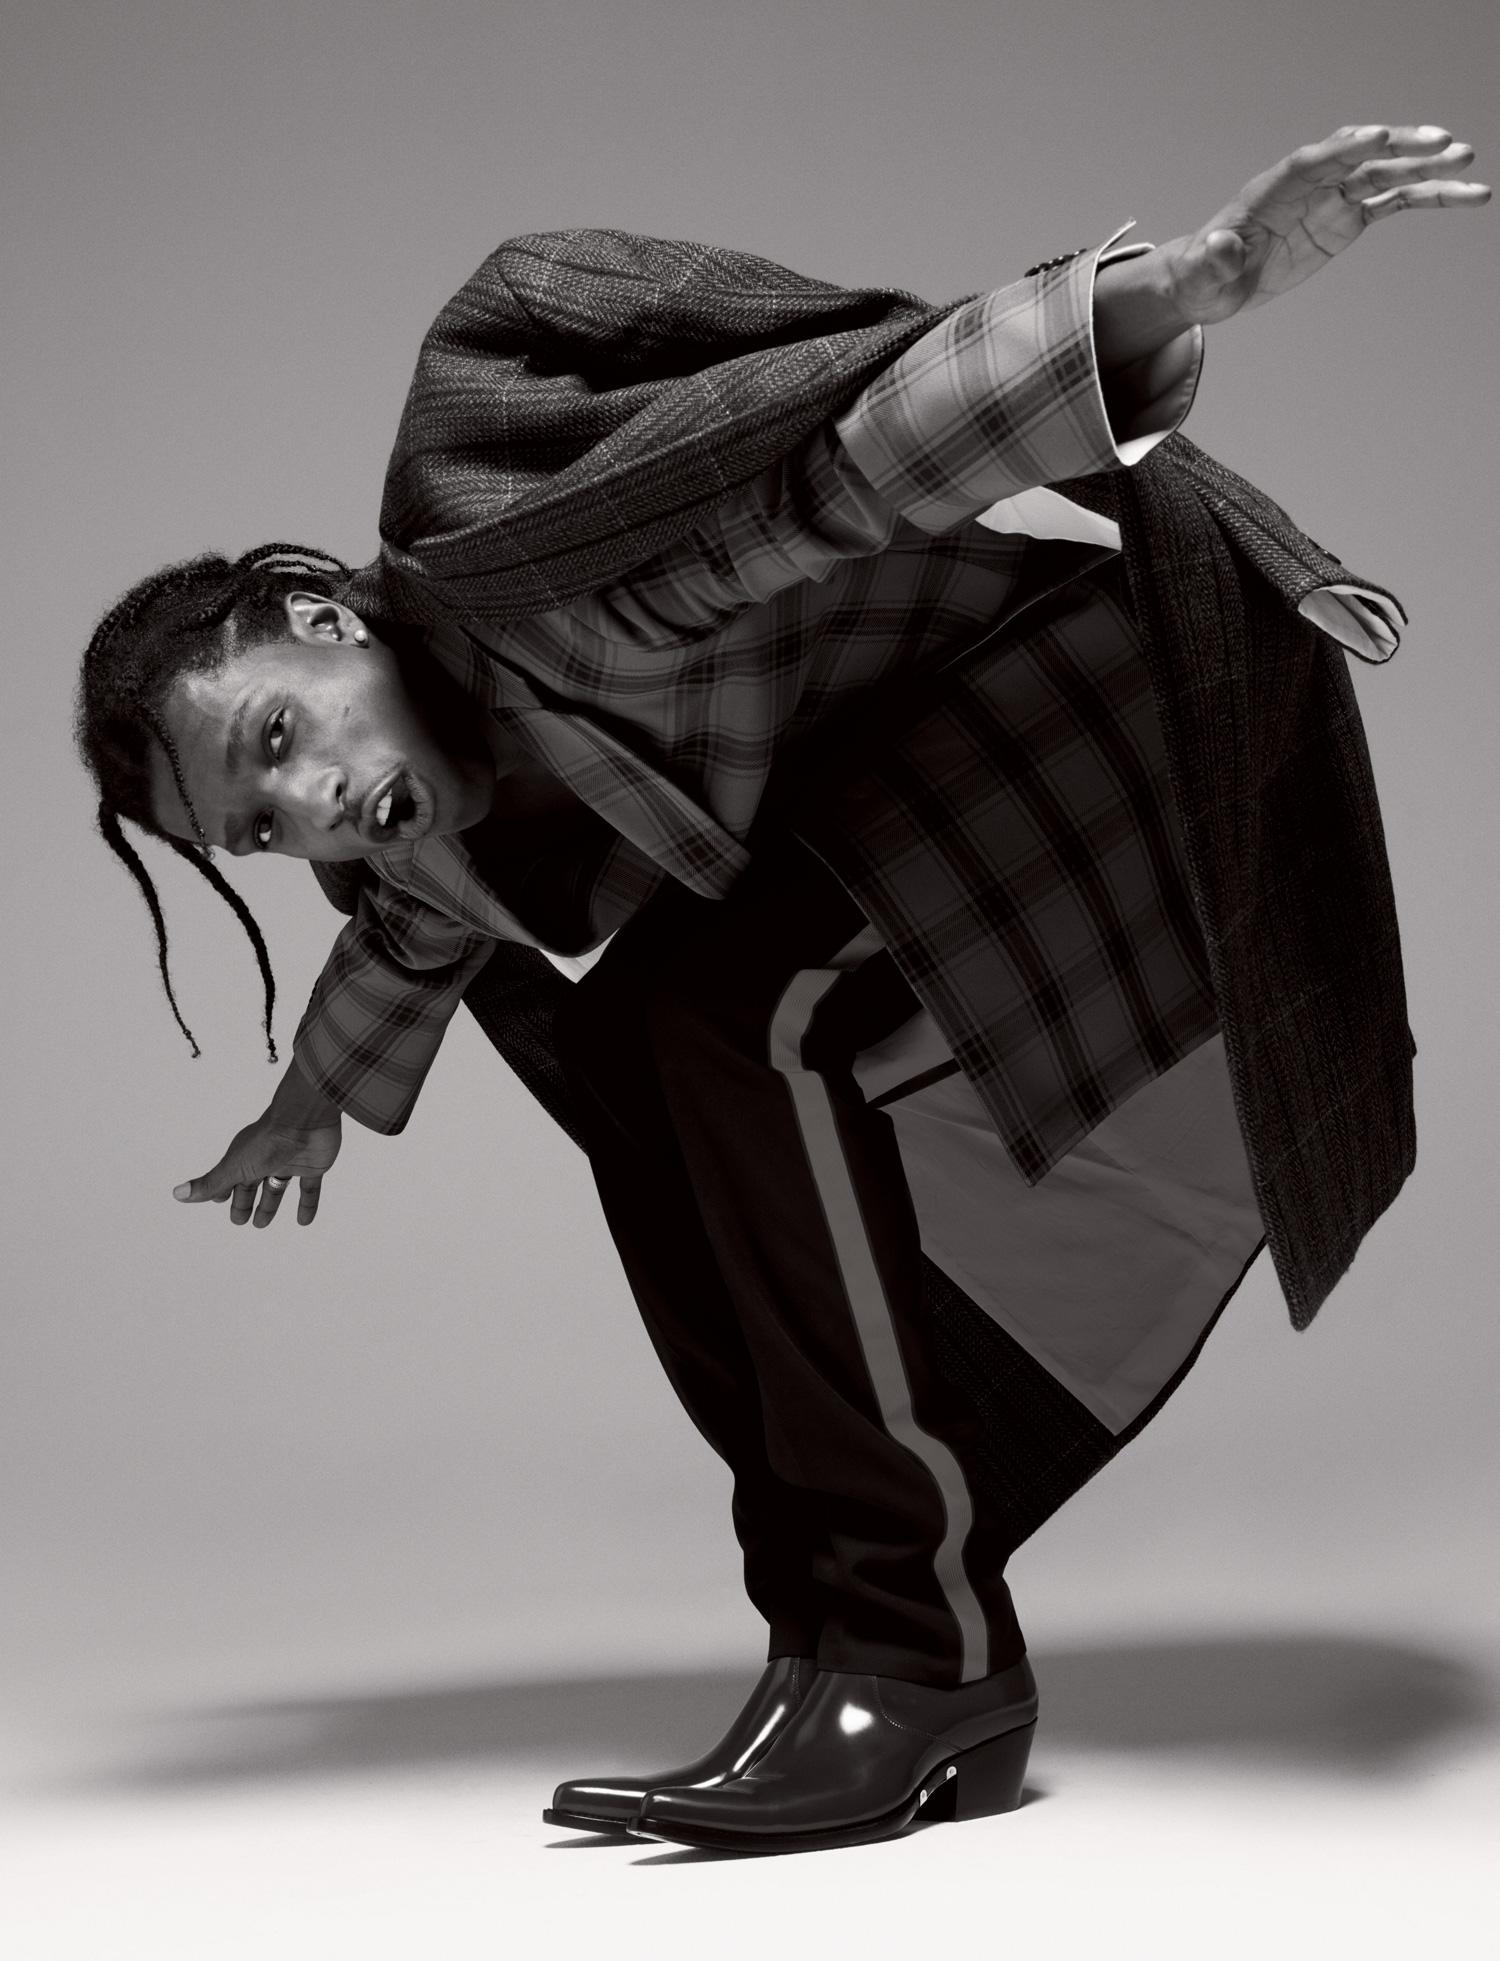 Пальто, брюки, ботинки — все Calvin Klein 205W39NYC.